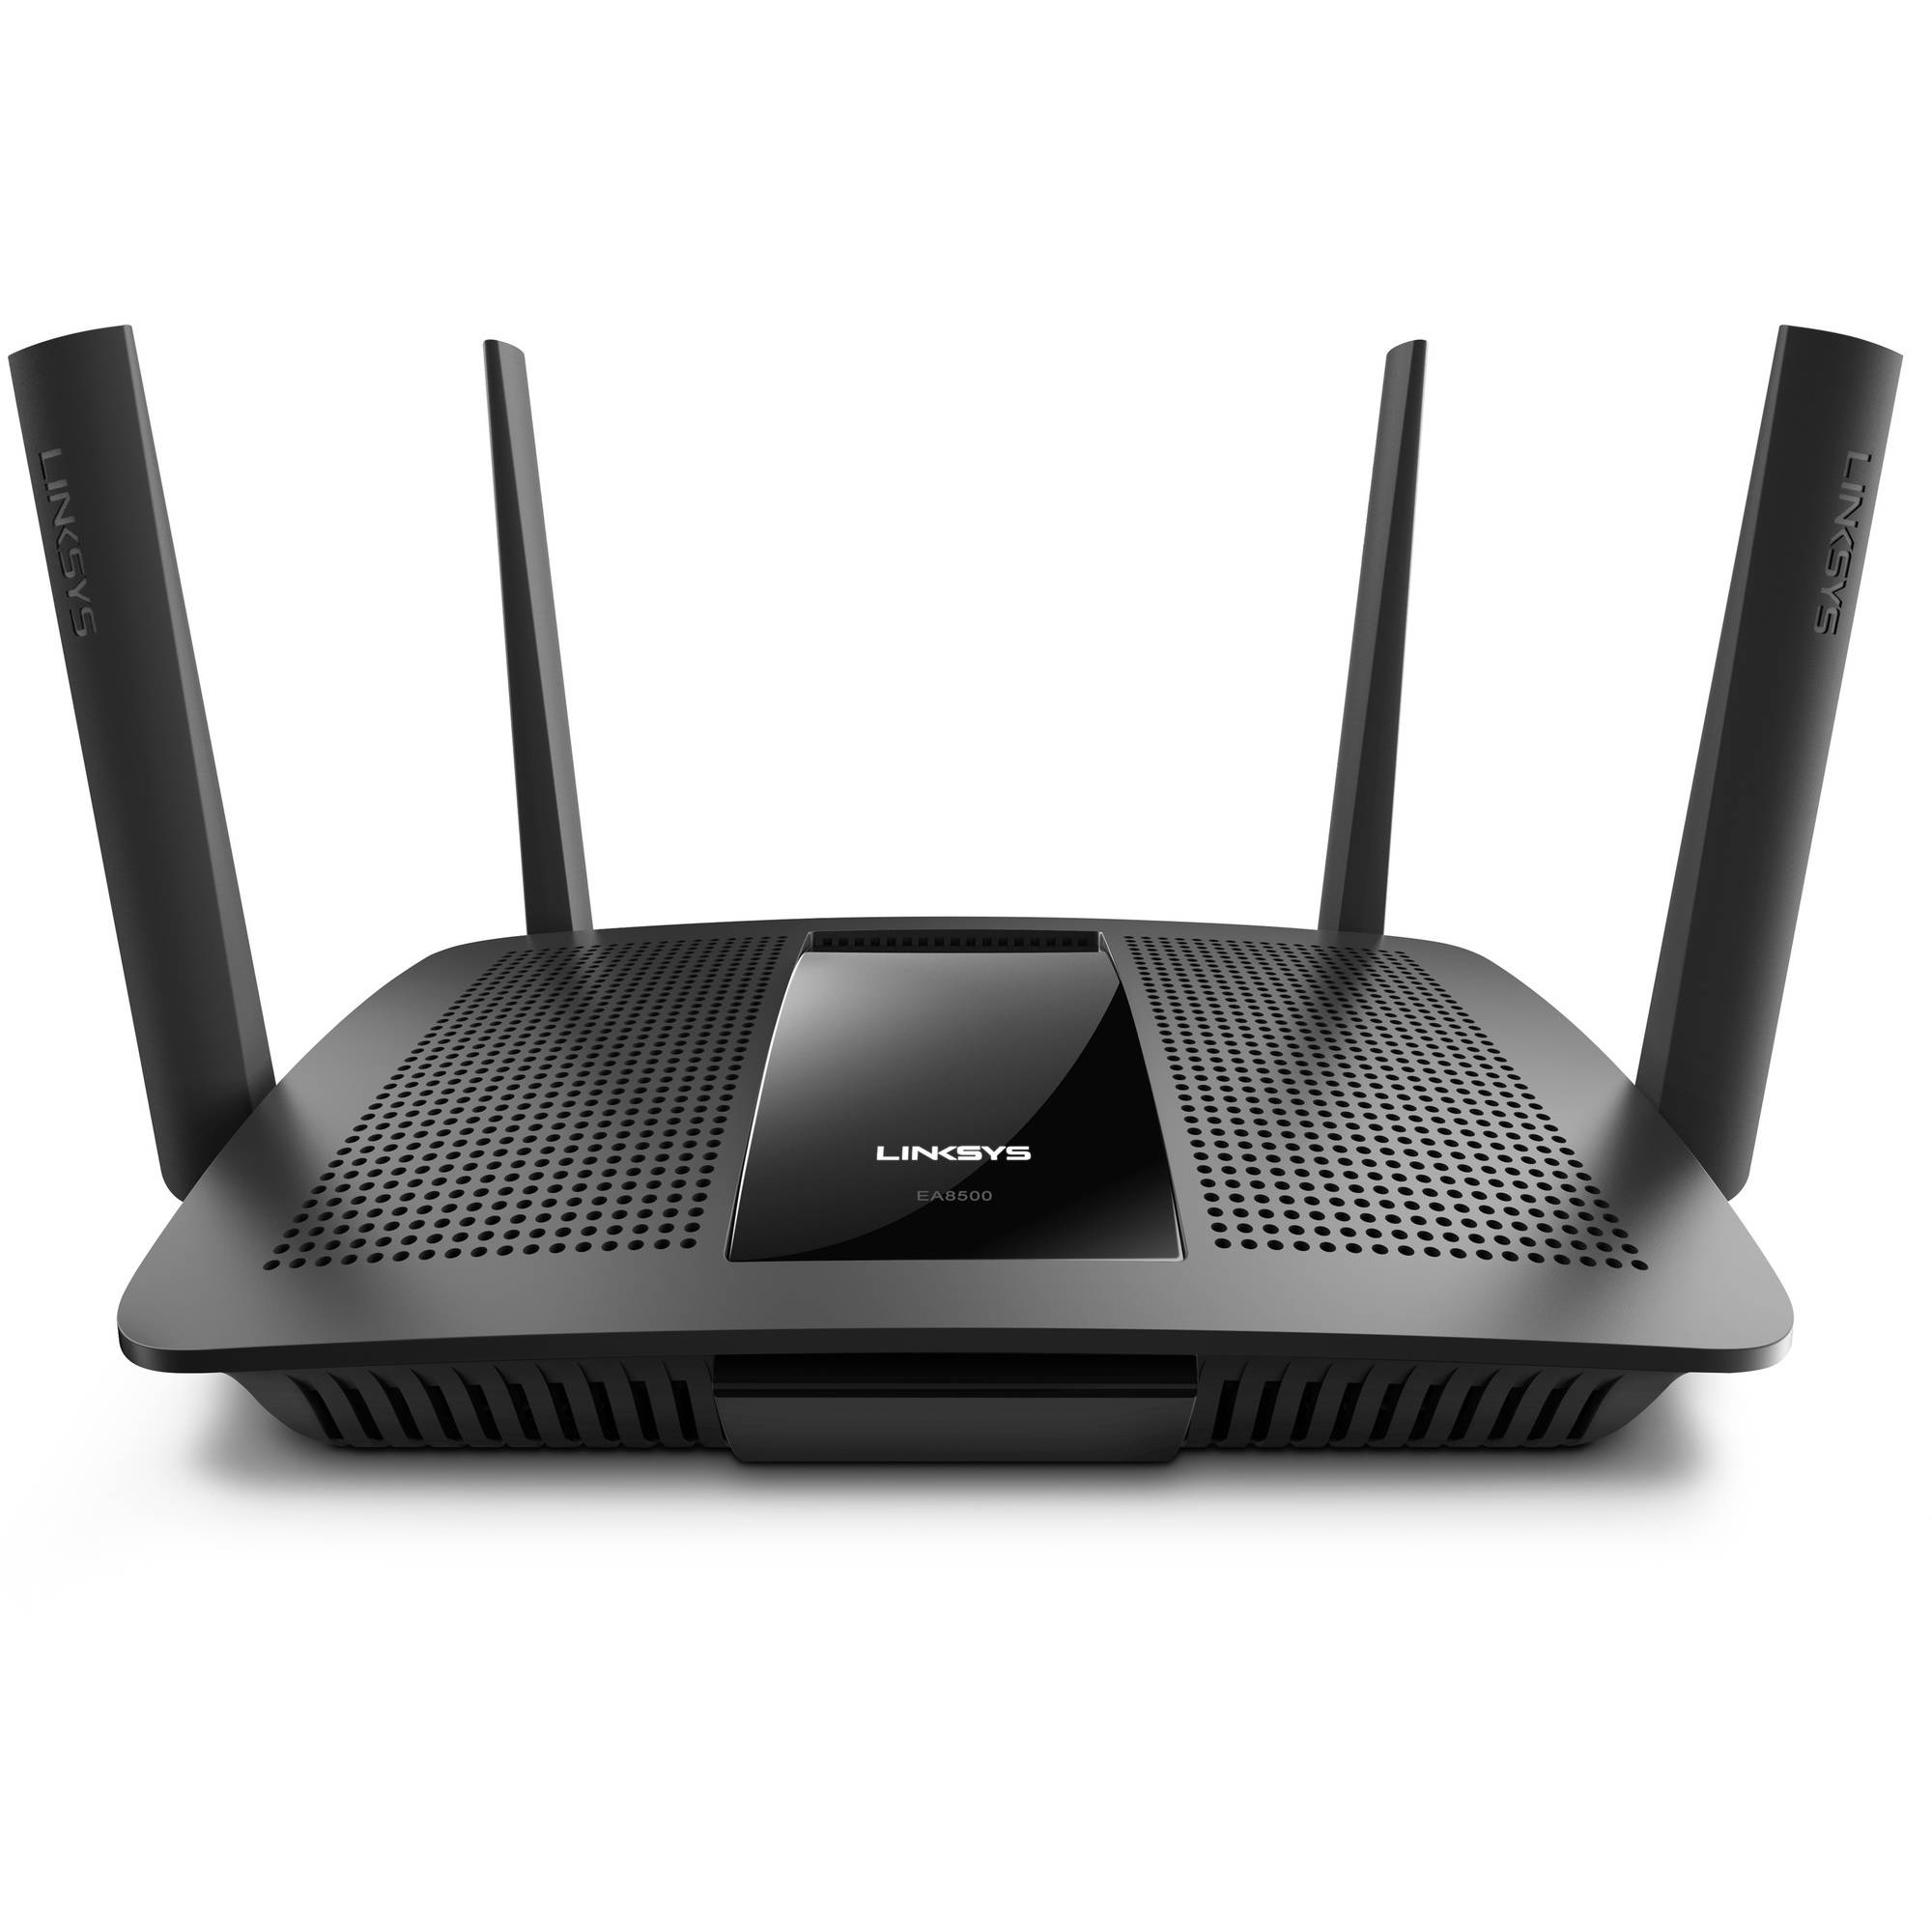 Linksys AC2600 Mu-Mimo Wi-Fi Router (EA8500)